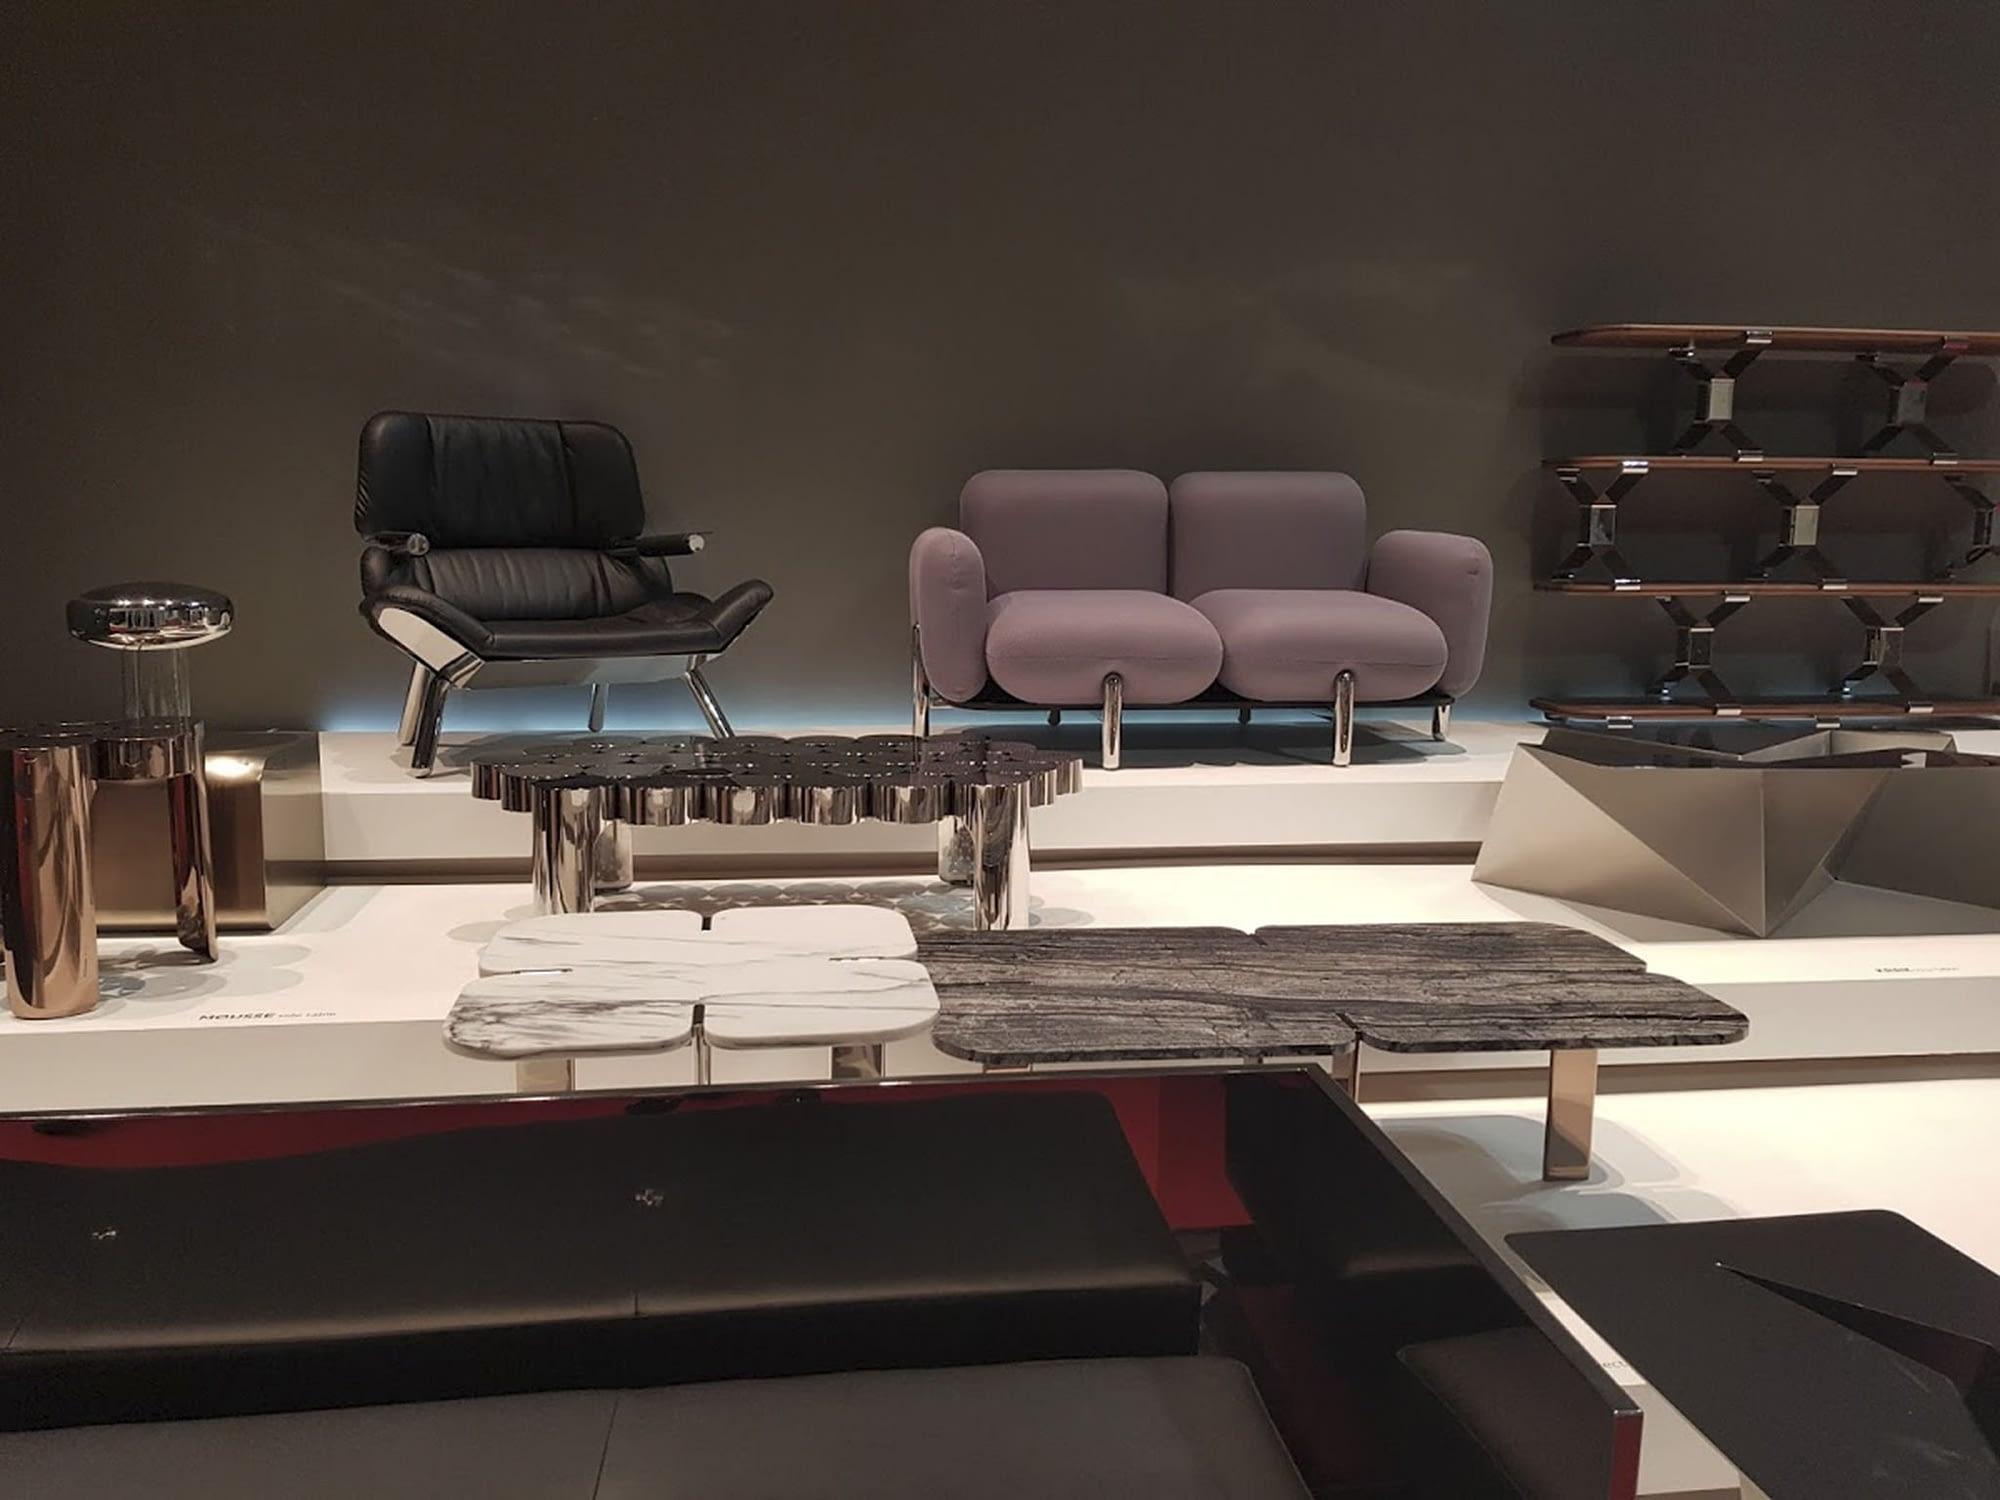 Milano Design Week 2018 - Salone del Mobile 69